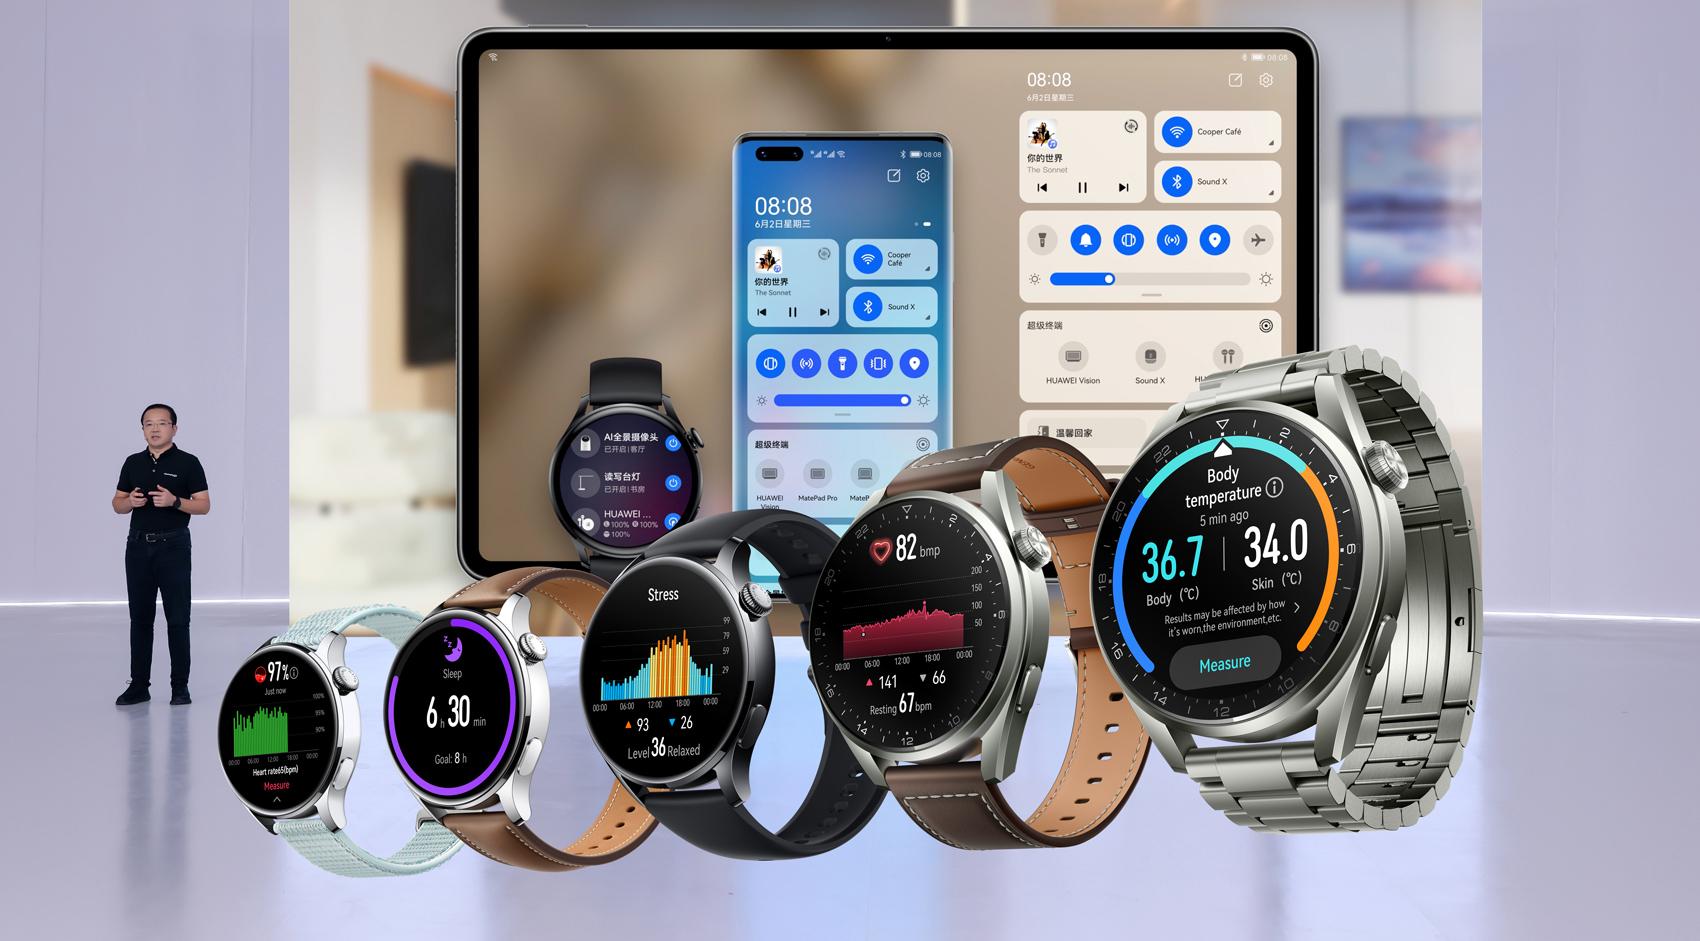 Новинки от Huawei: 4 продукта и операционная система HarmonyOS-2